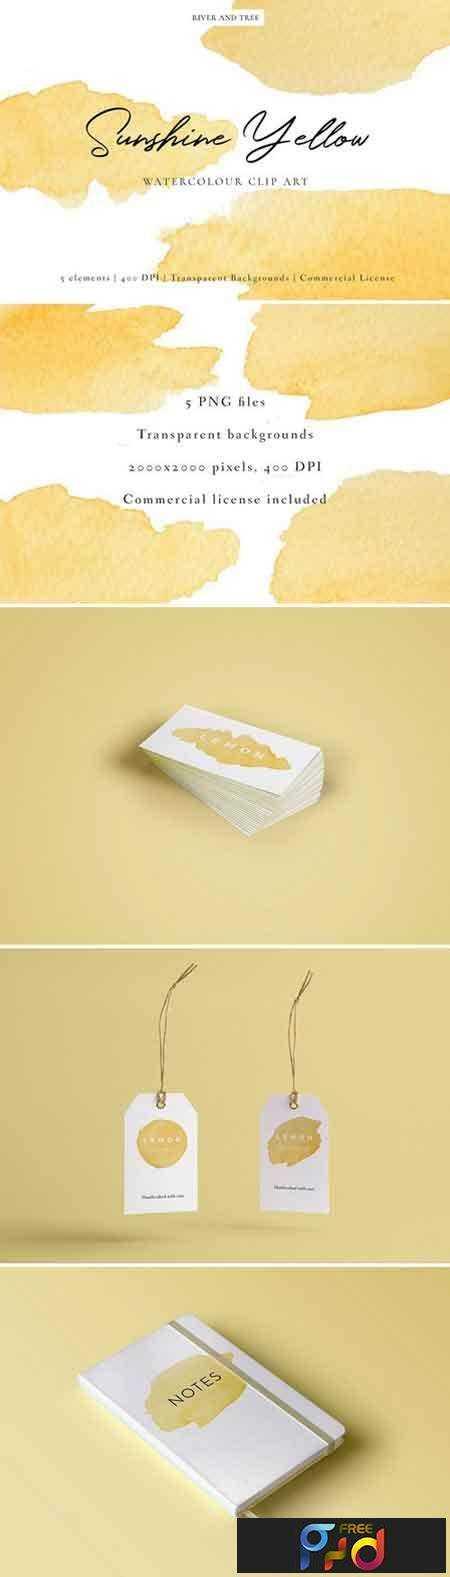 1804244 Sunshine Yellow Clip Art 2232576 1